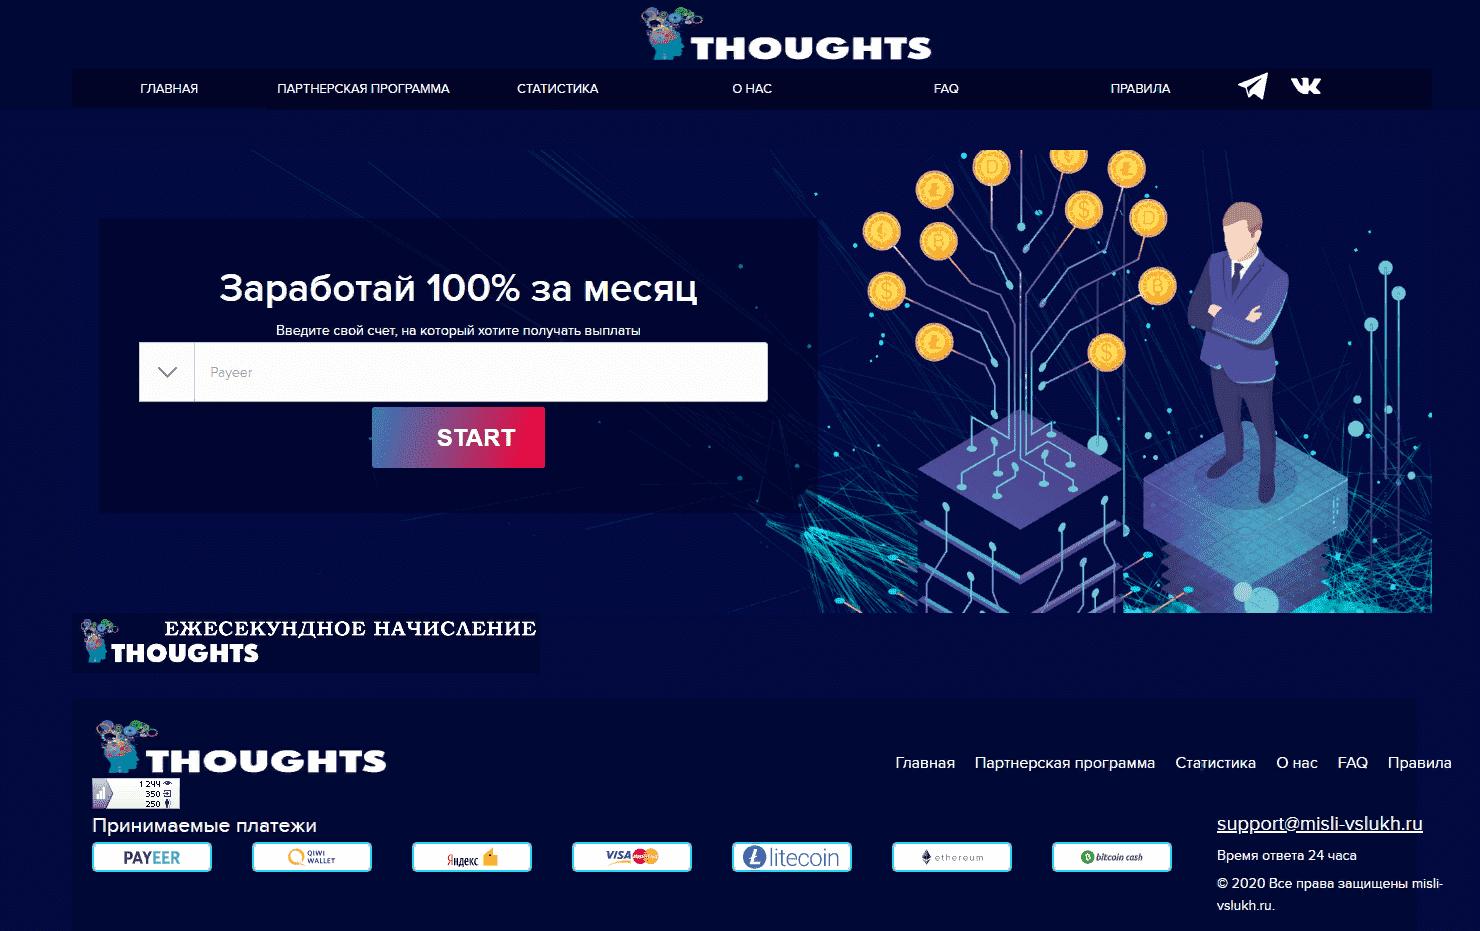 Misli-vslukh